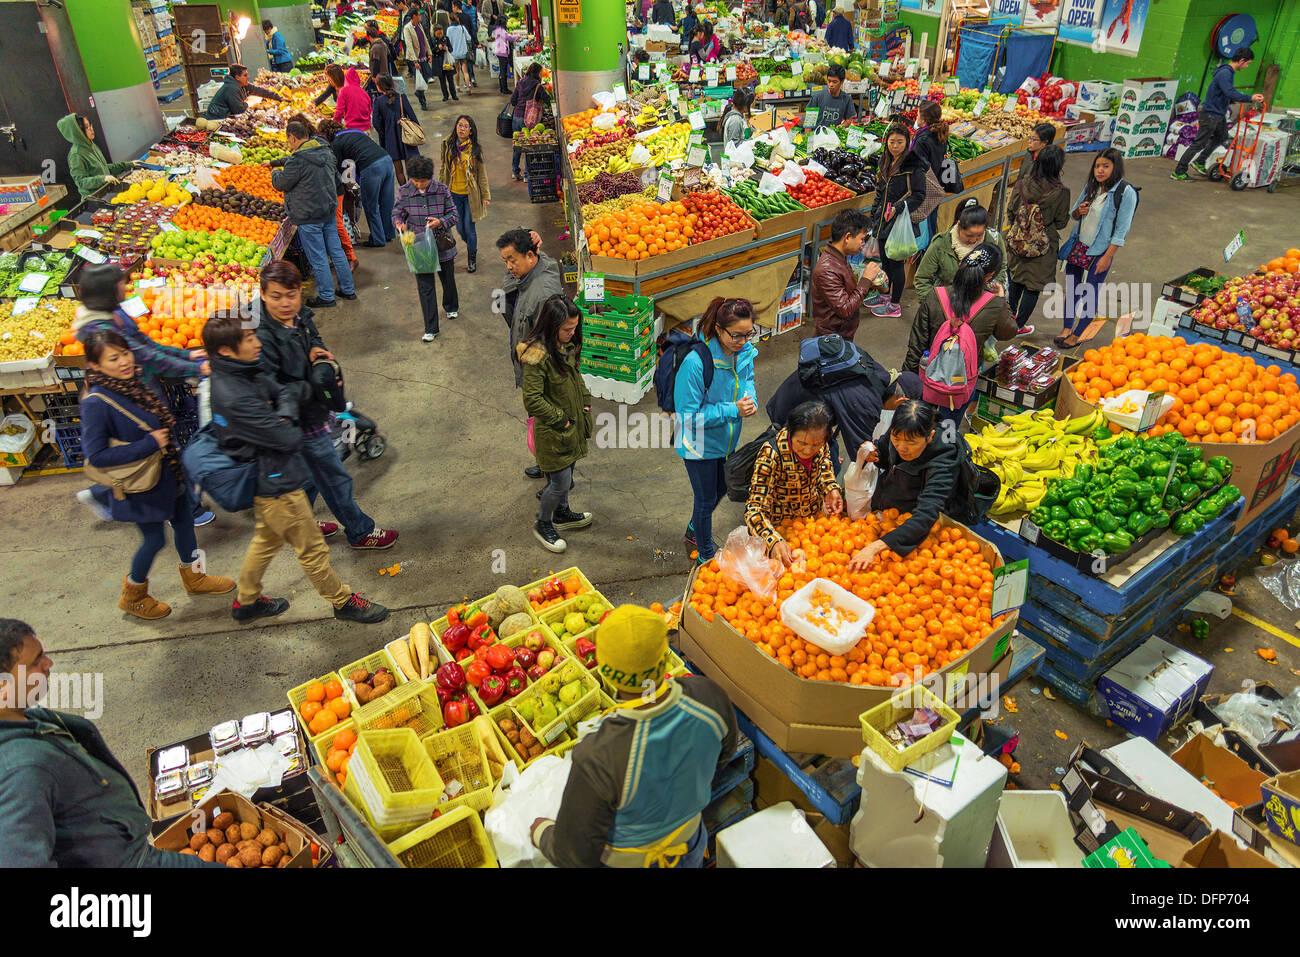 paddy's markets interior in sydney australia - Stock Image